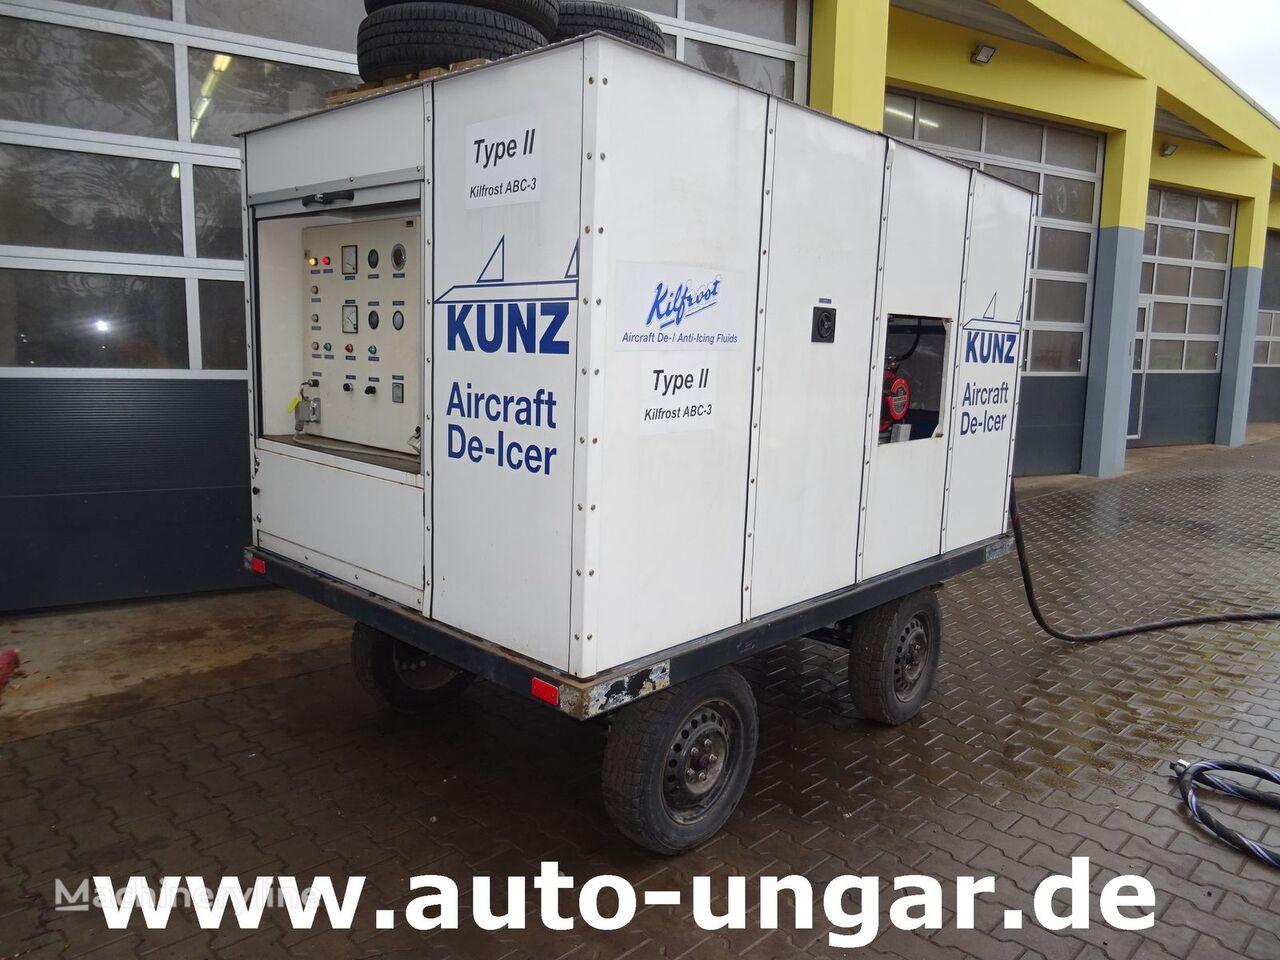 другая аэродромная техника Kunz Aircraft De-Icer Anti-Icer 1200E GSE